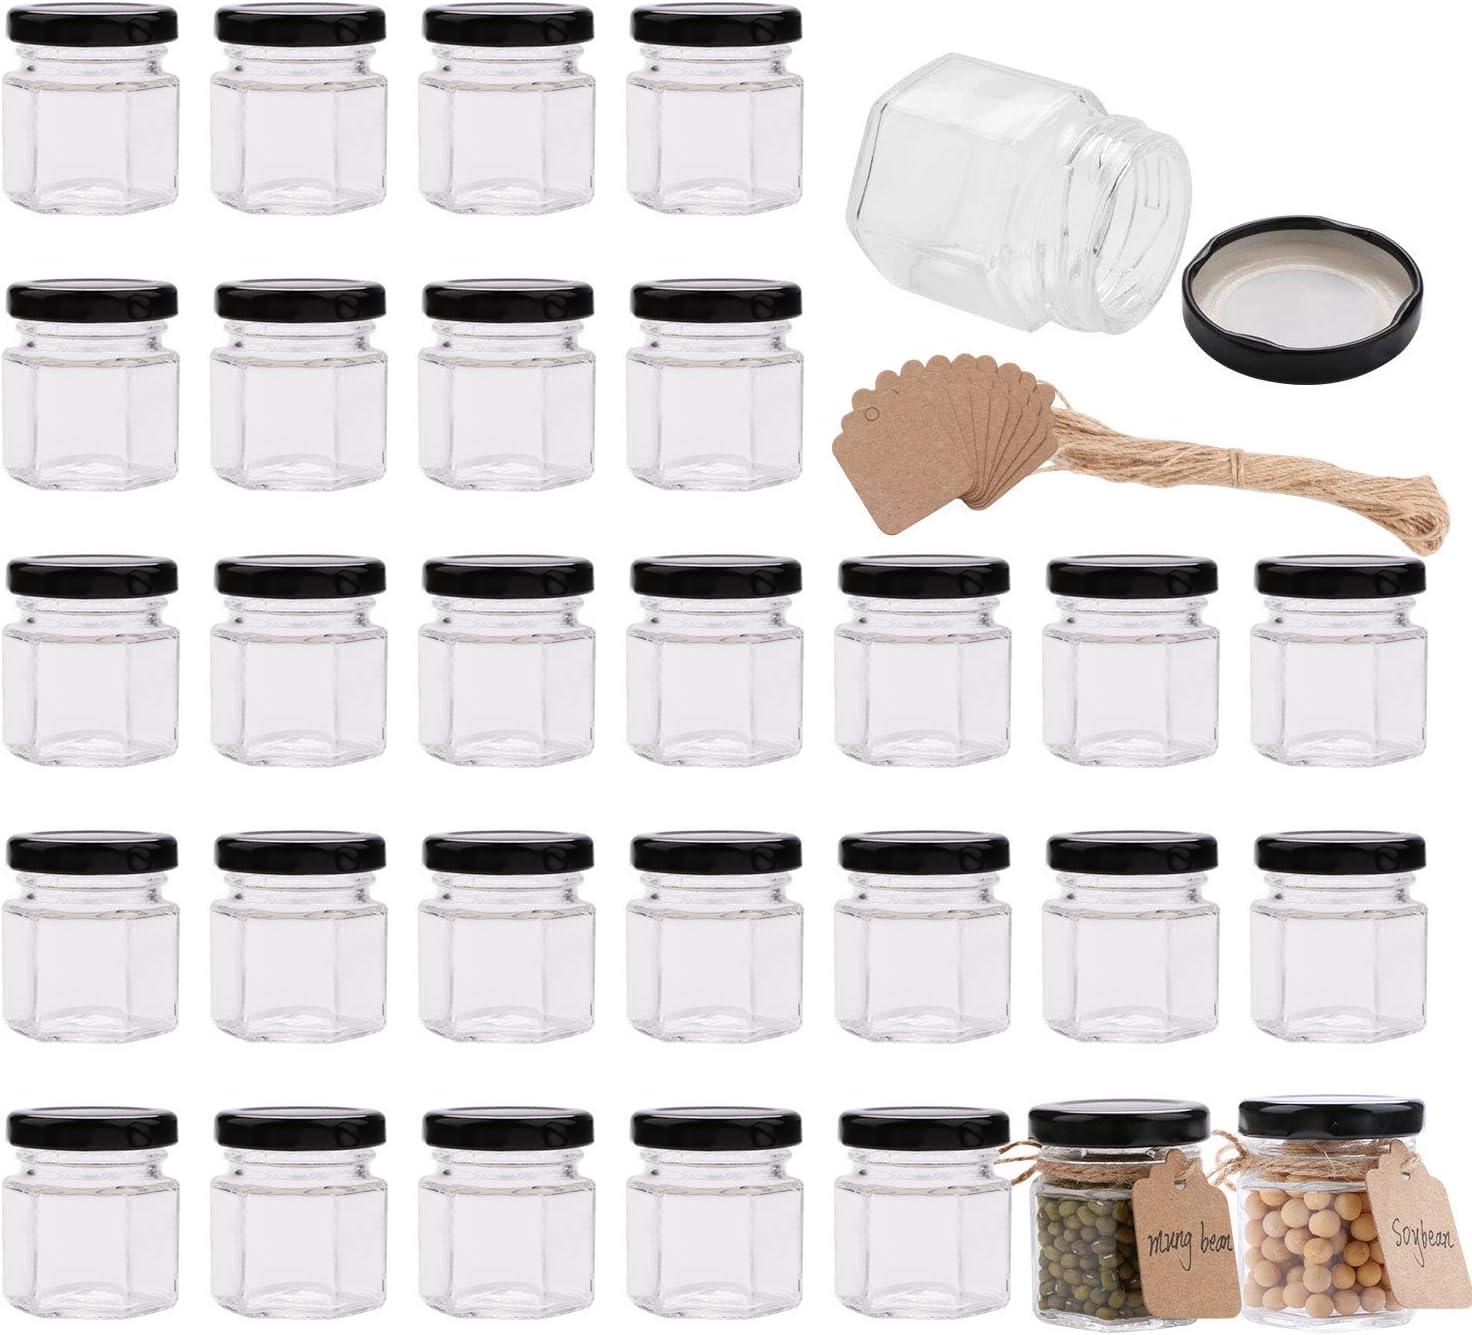 Encheng 1.5 oz Clear Hexagon Jars,Small Glass Jars With Lids(black),Mason Jars For Herbs,Foods,Jams,Liquid,Mini Spice Jars For Storage 30 Pack …